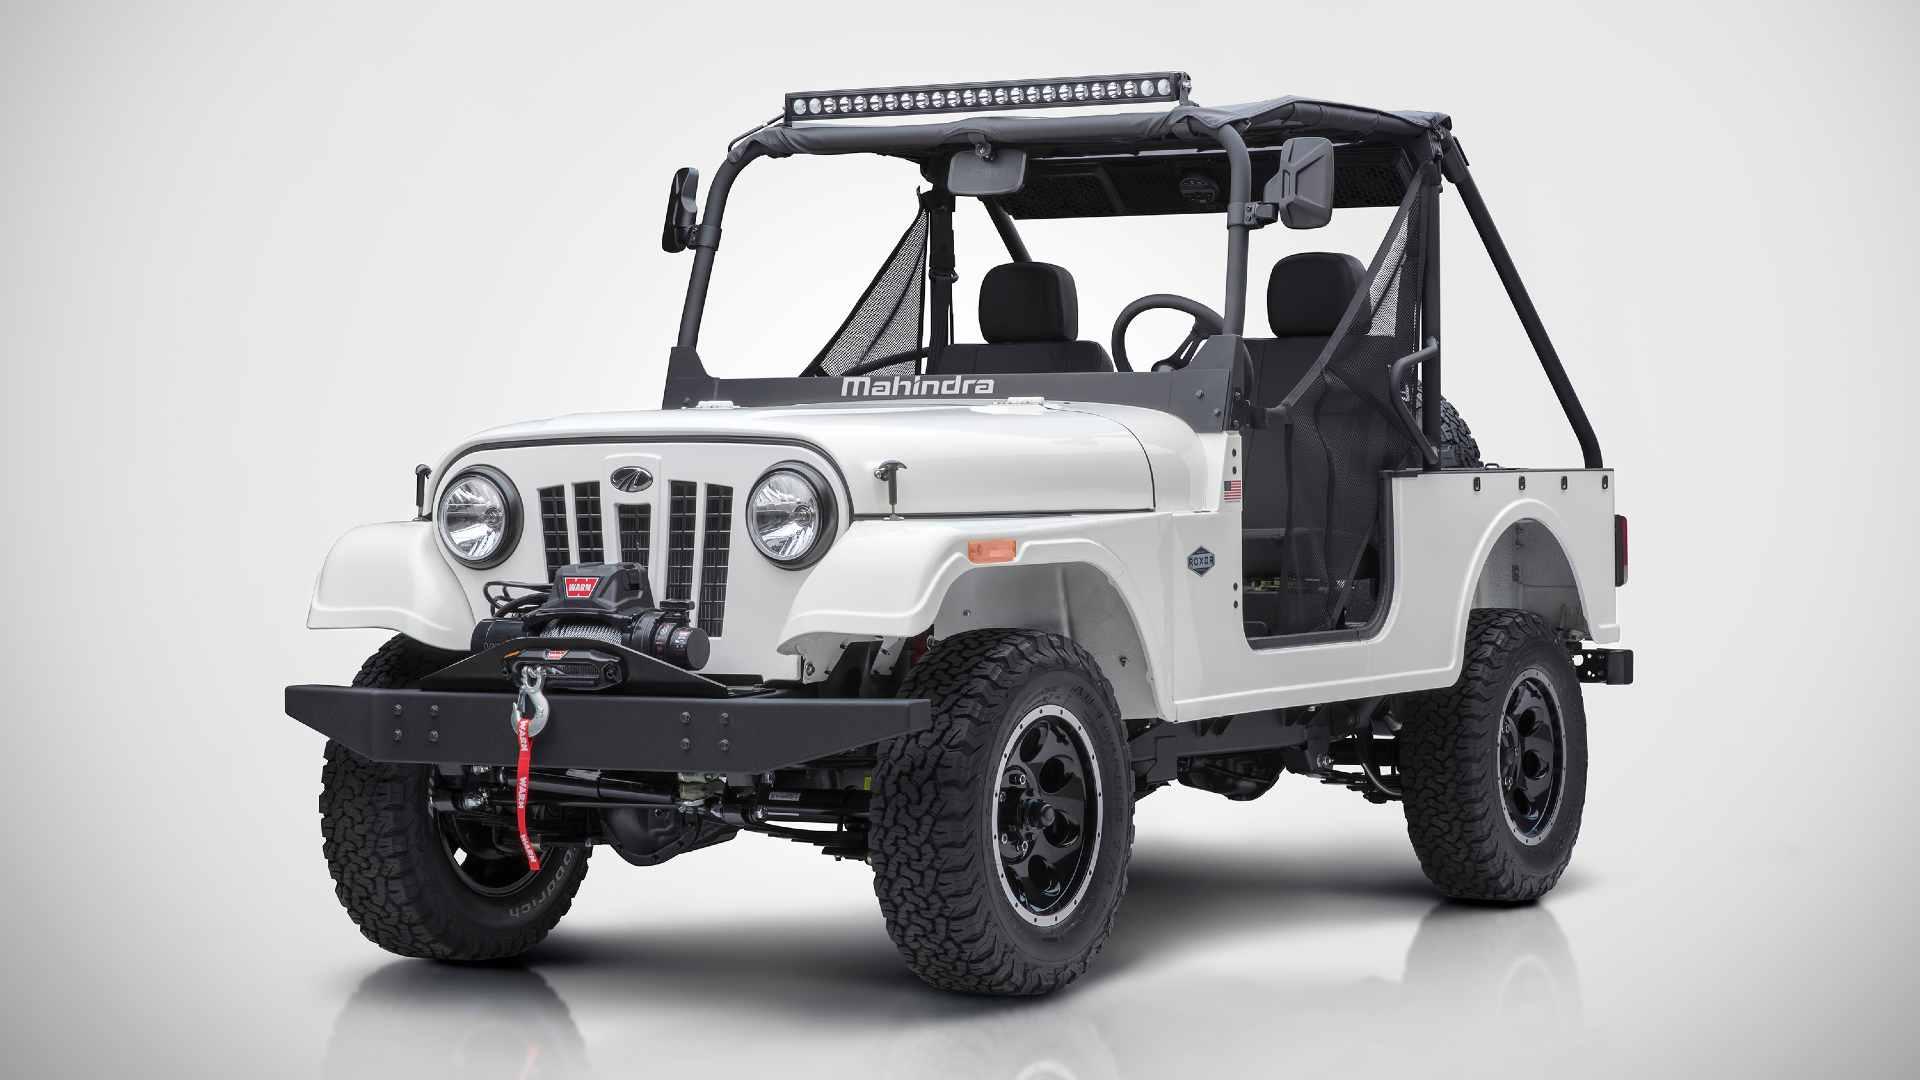 Mahindra's Roxor off-highway vehicle was deemed to violate Jeep's trade dress in the US. Image: Mahindra